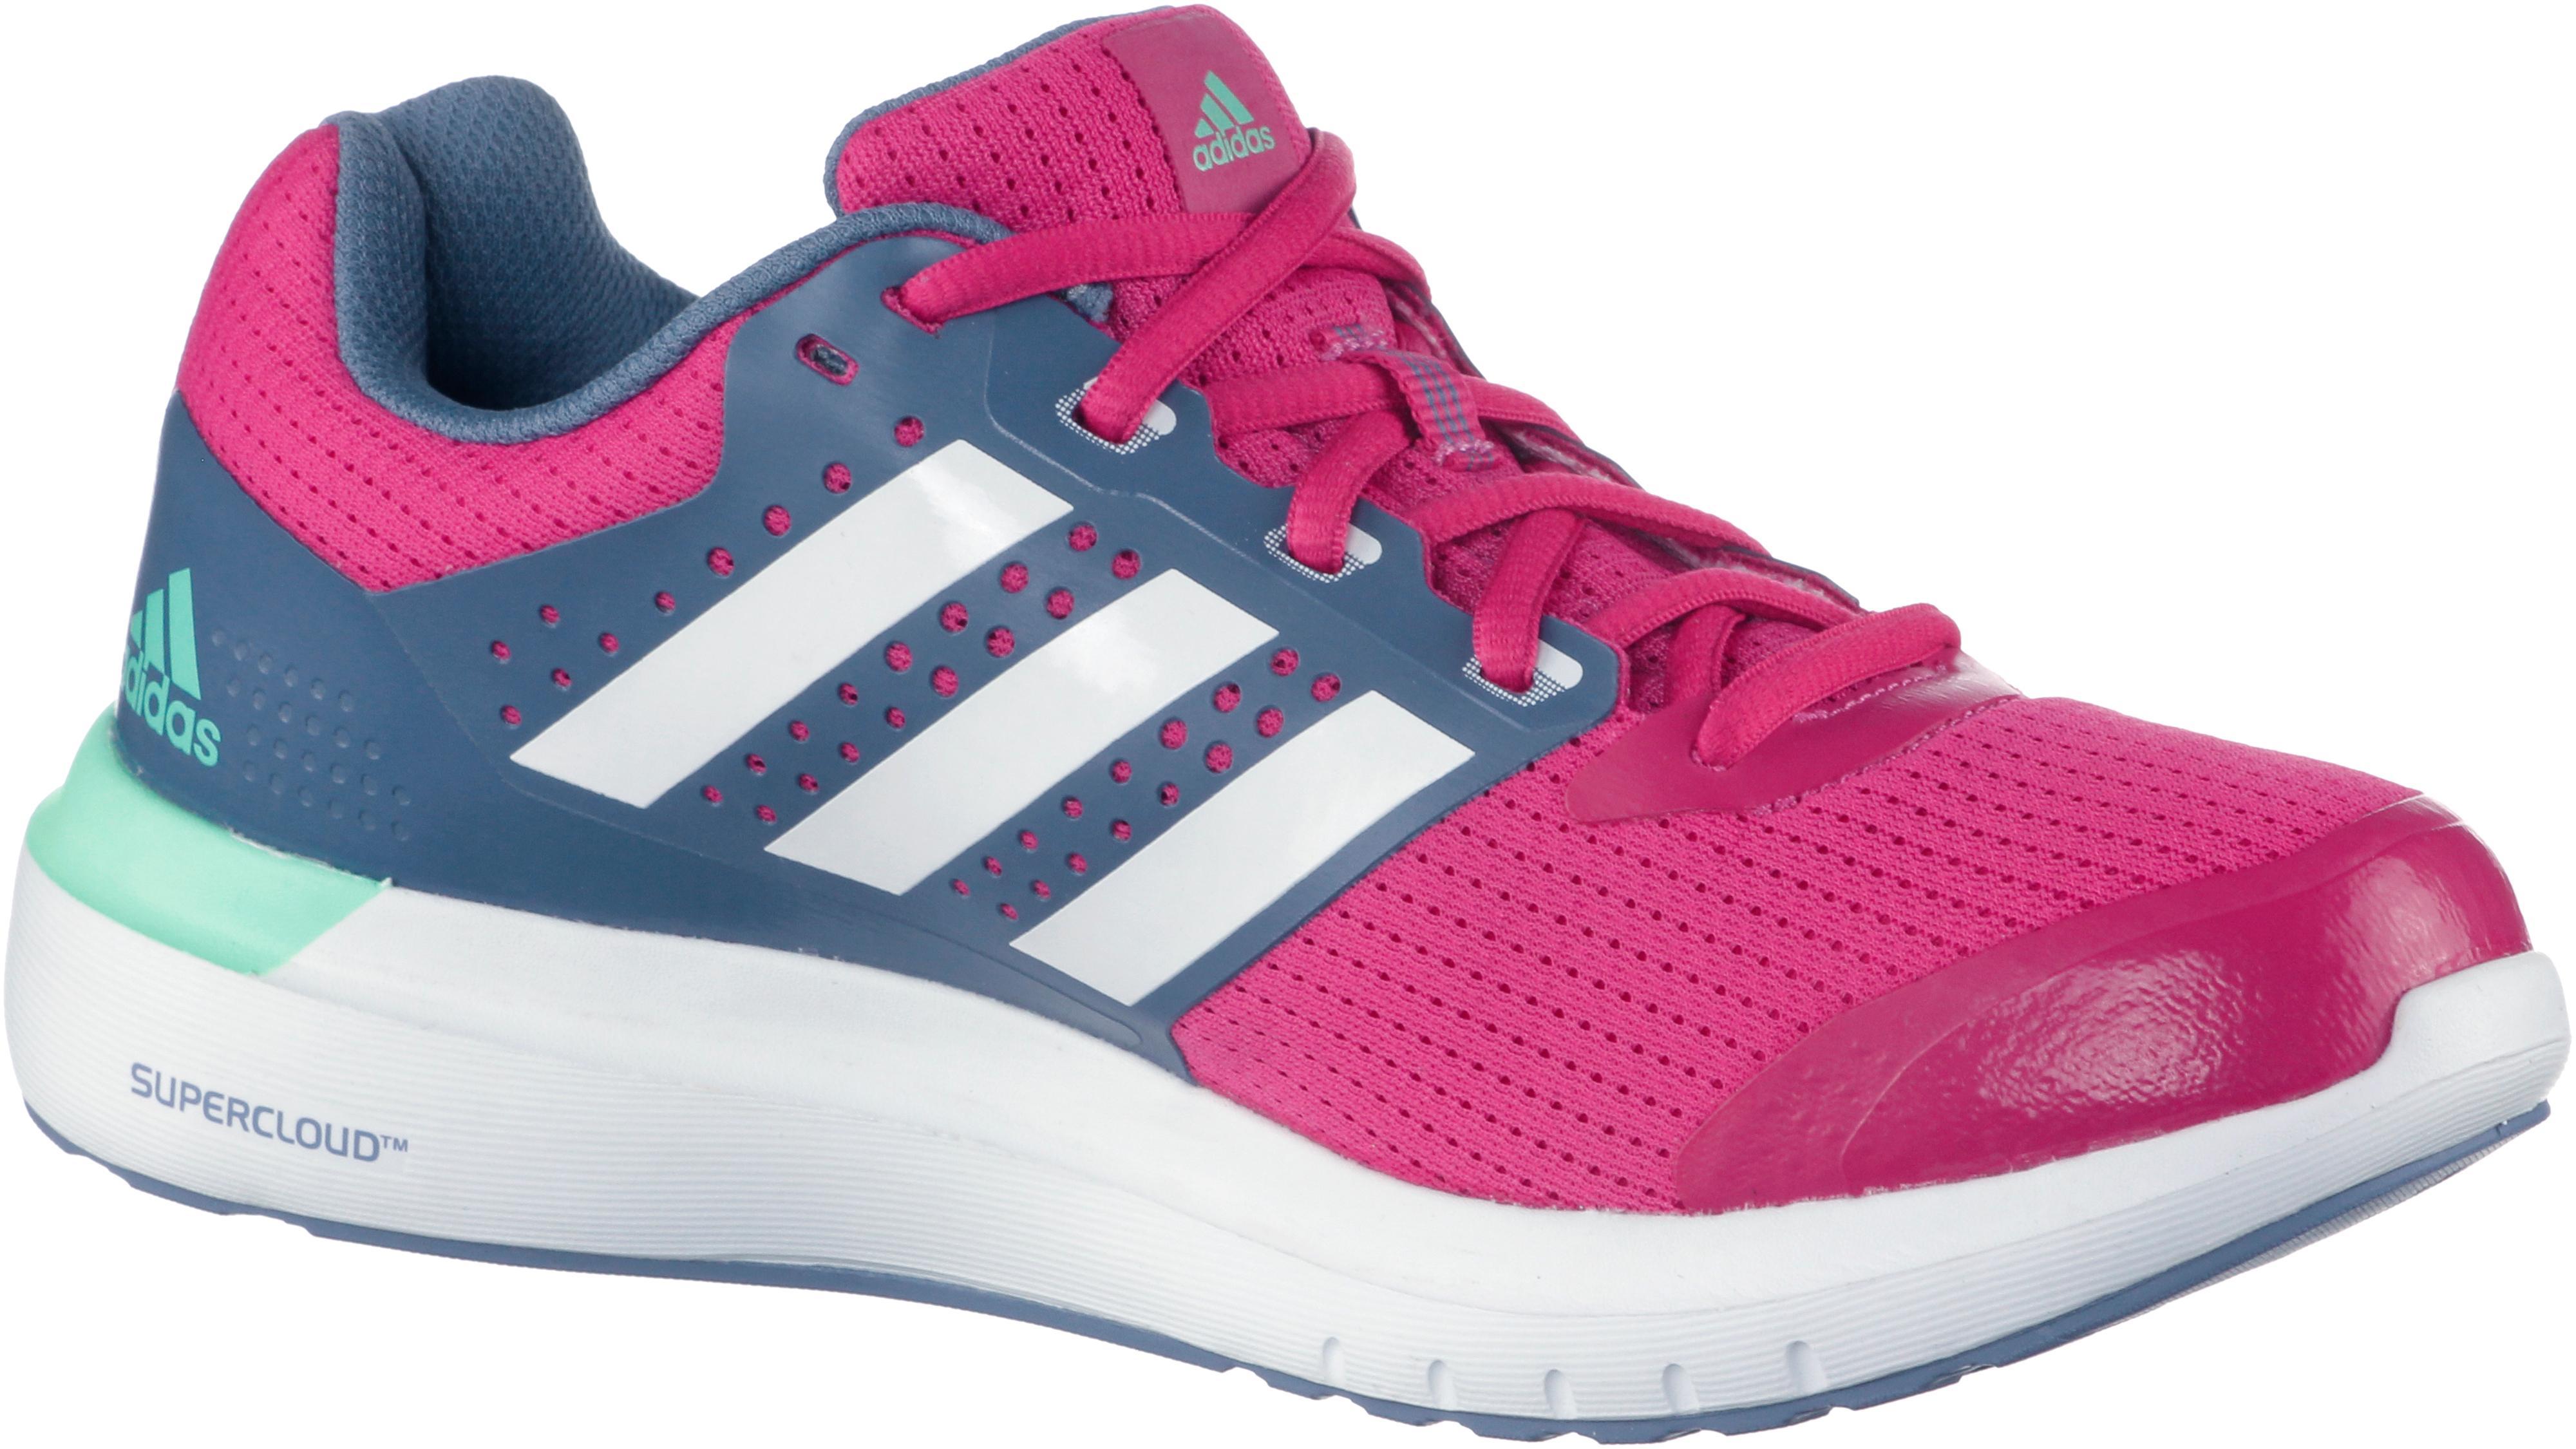 Adidas Duramo 7 Damen Laufschuh (schwarzpink)